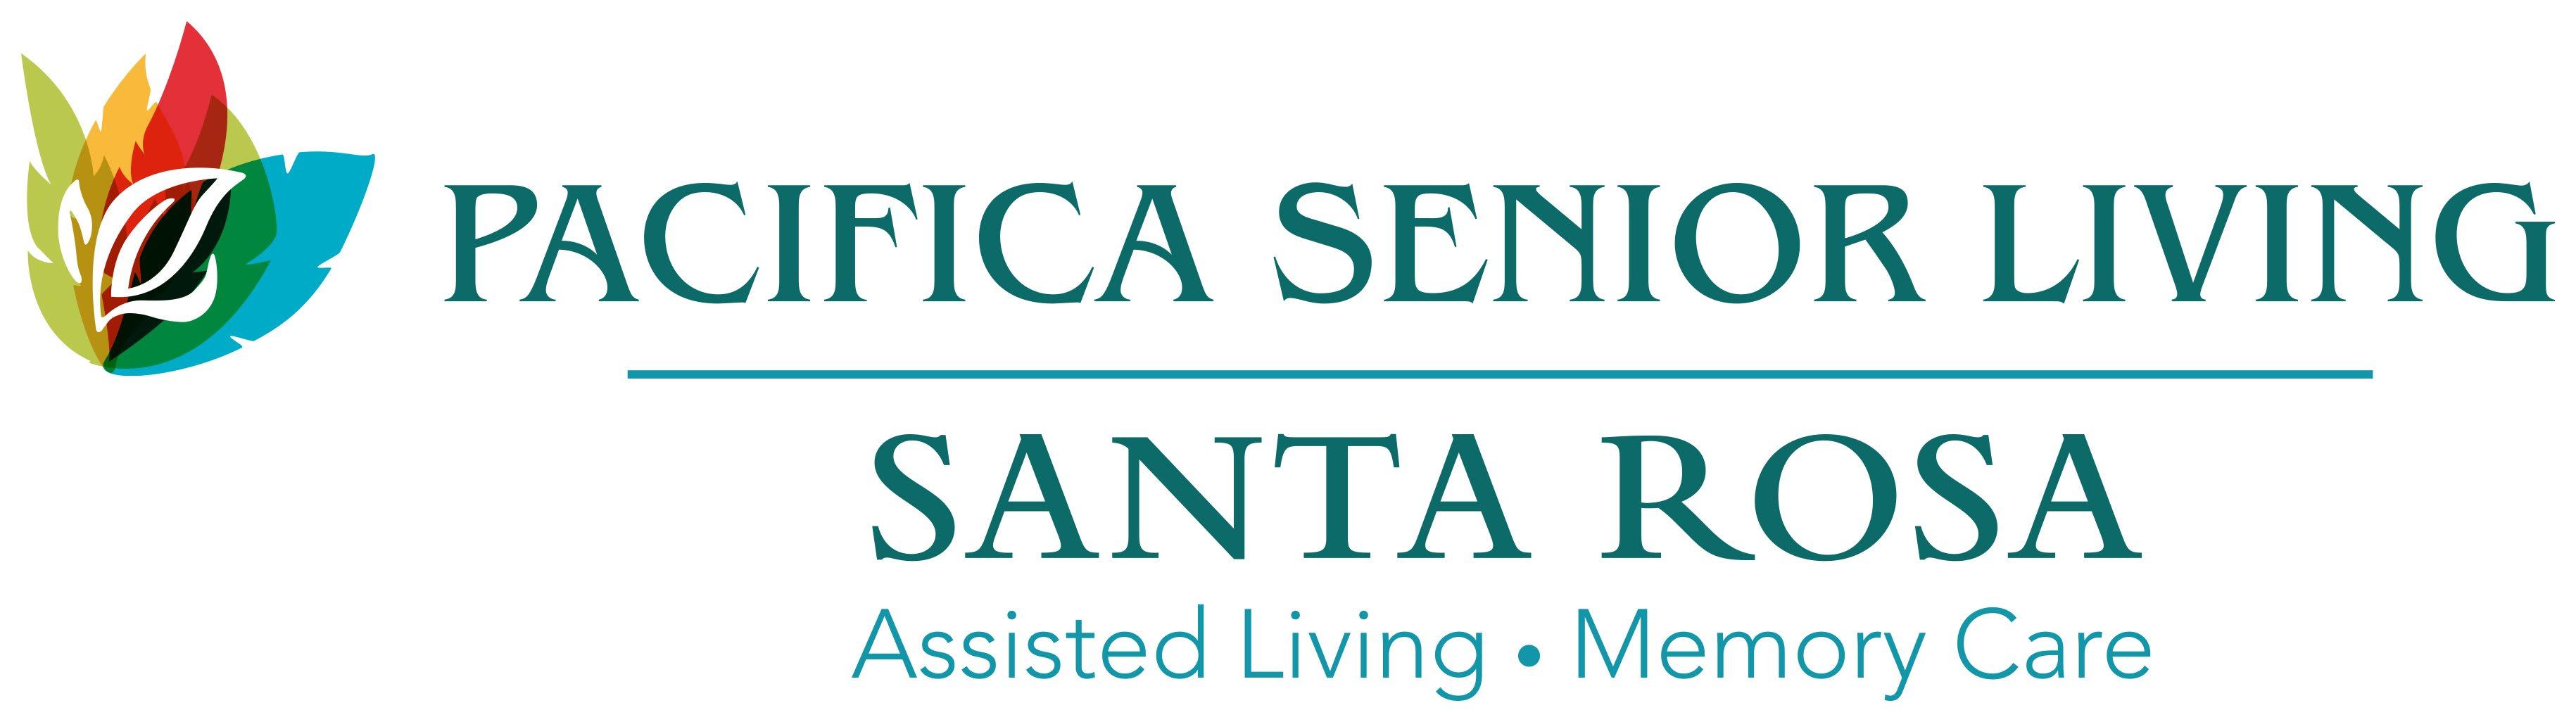 Photo 1 of Pacifica Senior Living Santa Rosa (Opening Fall 2021)